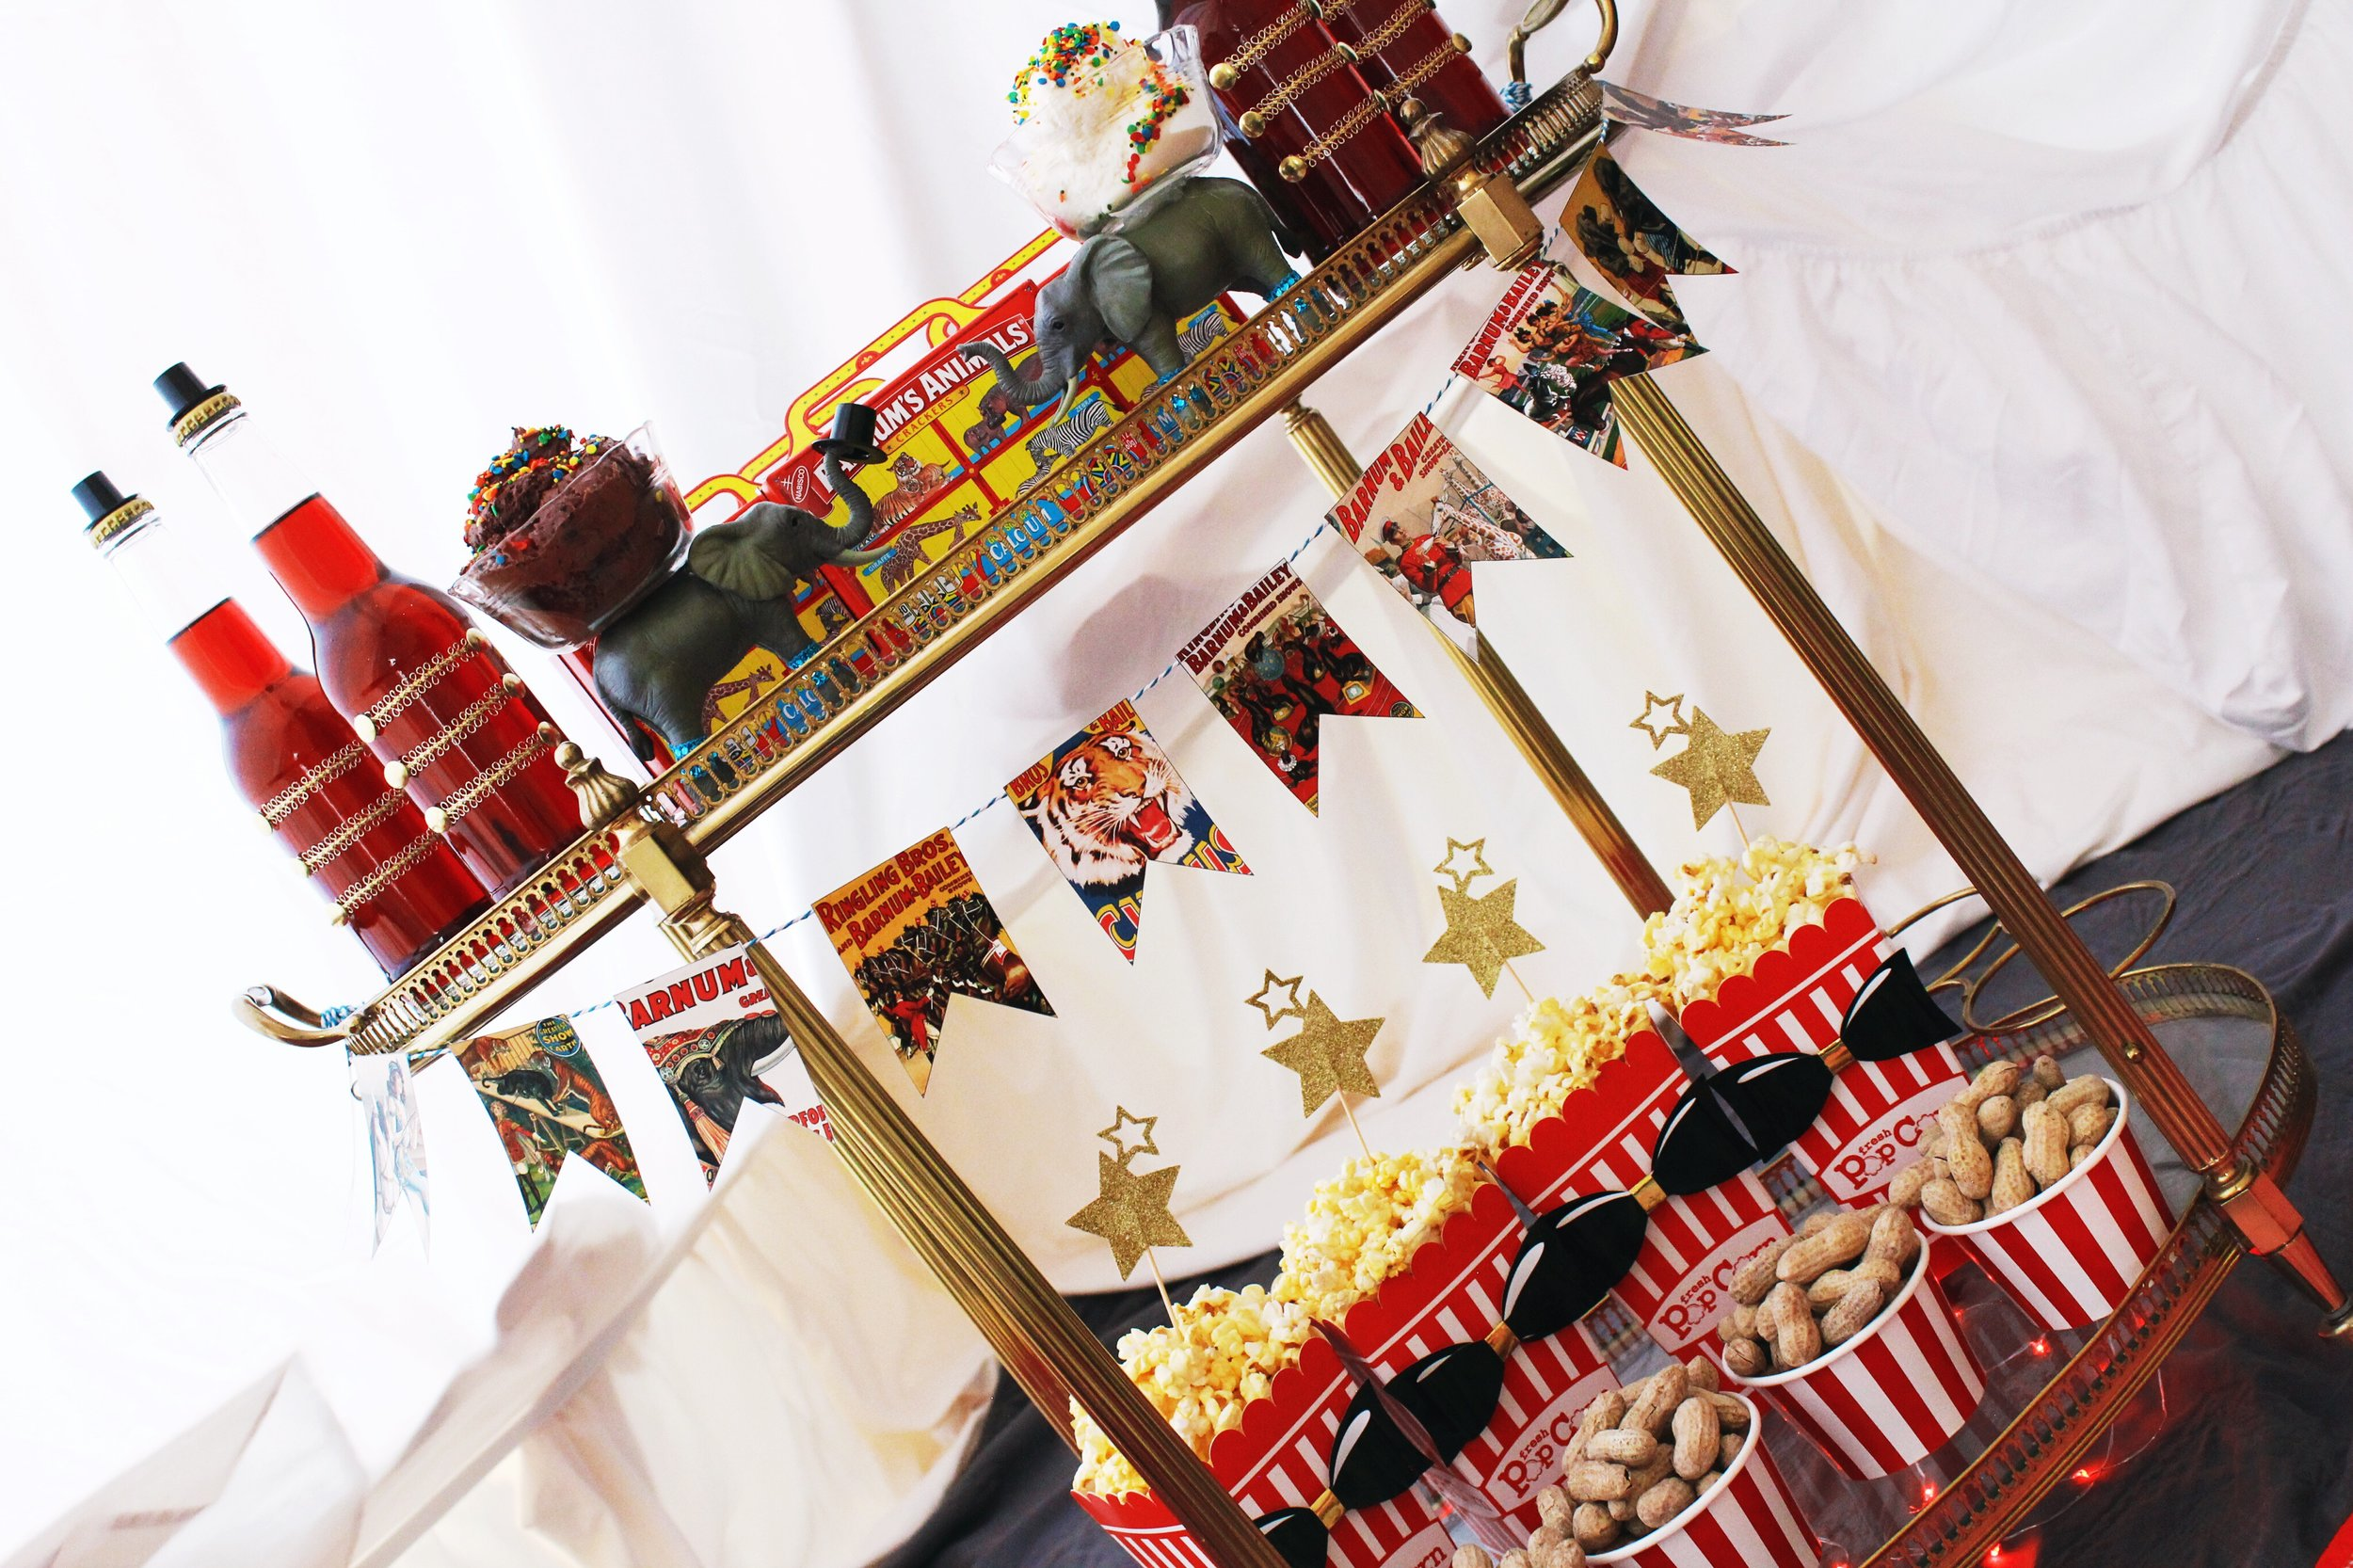 The Greatest Showman Movie Party_Bar Cart_Food Ideas_Circus Tent_Drinks.JPG